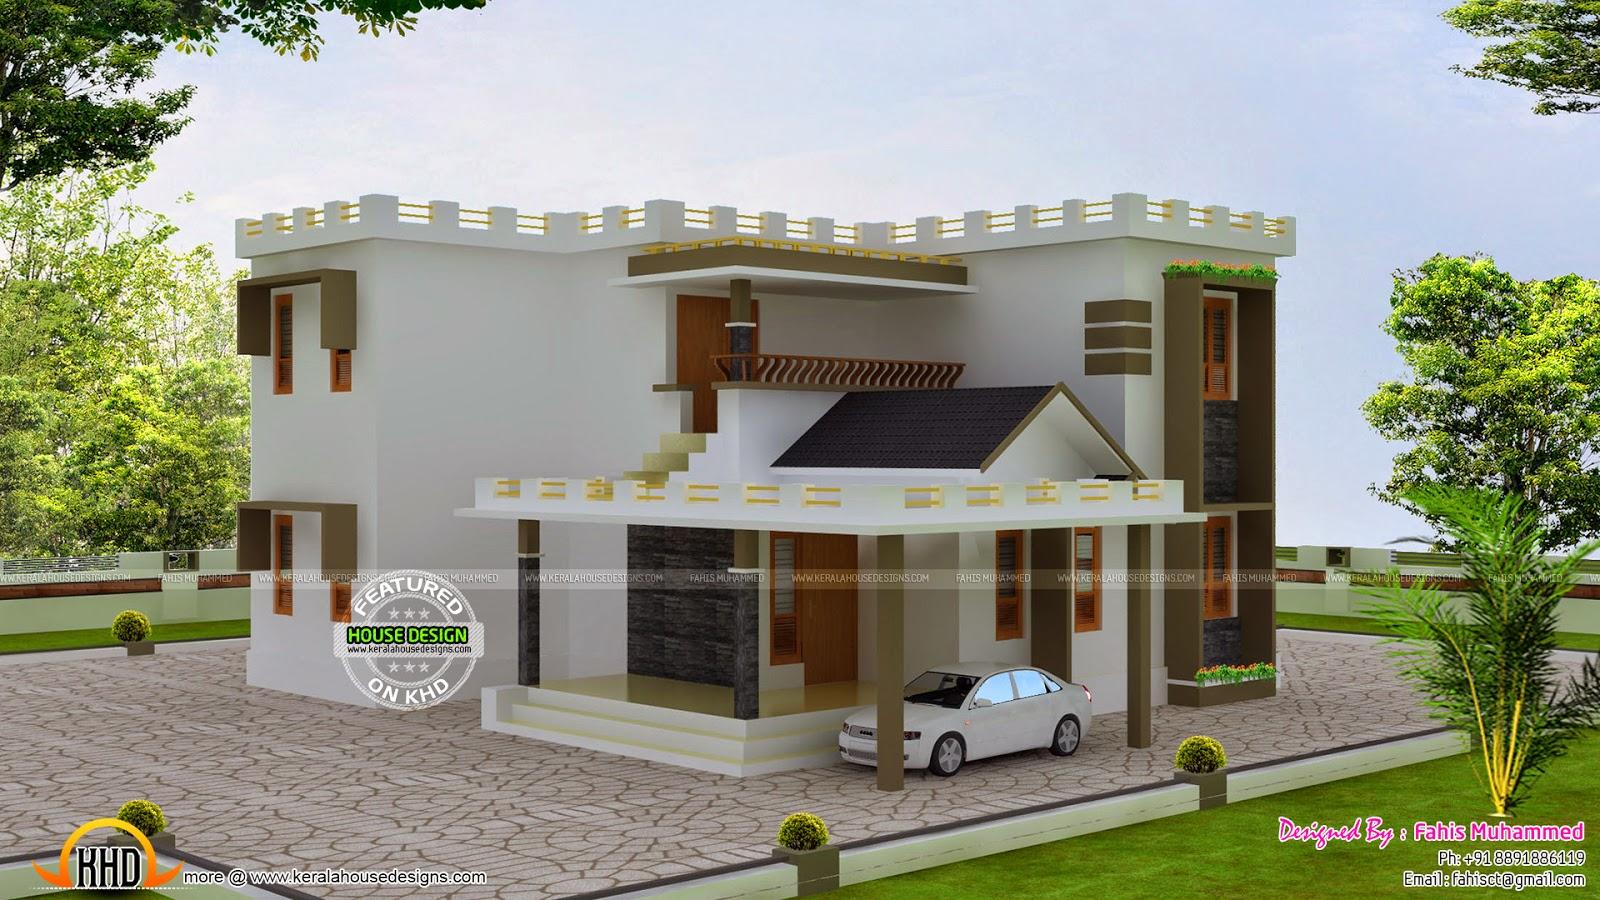 Decorative Flat Roof : Flat roof decorative home kerala design and floor plans